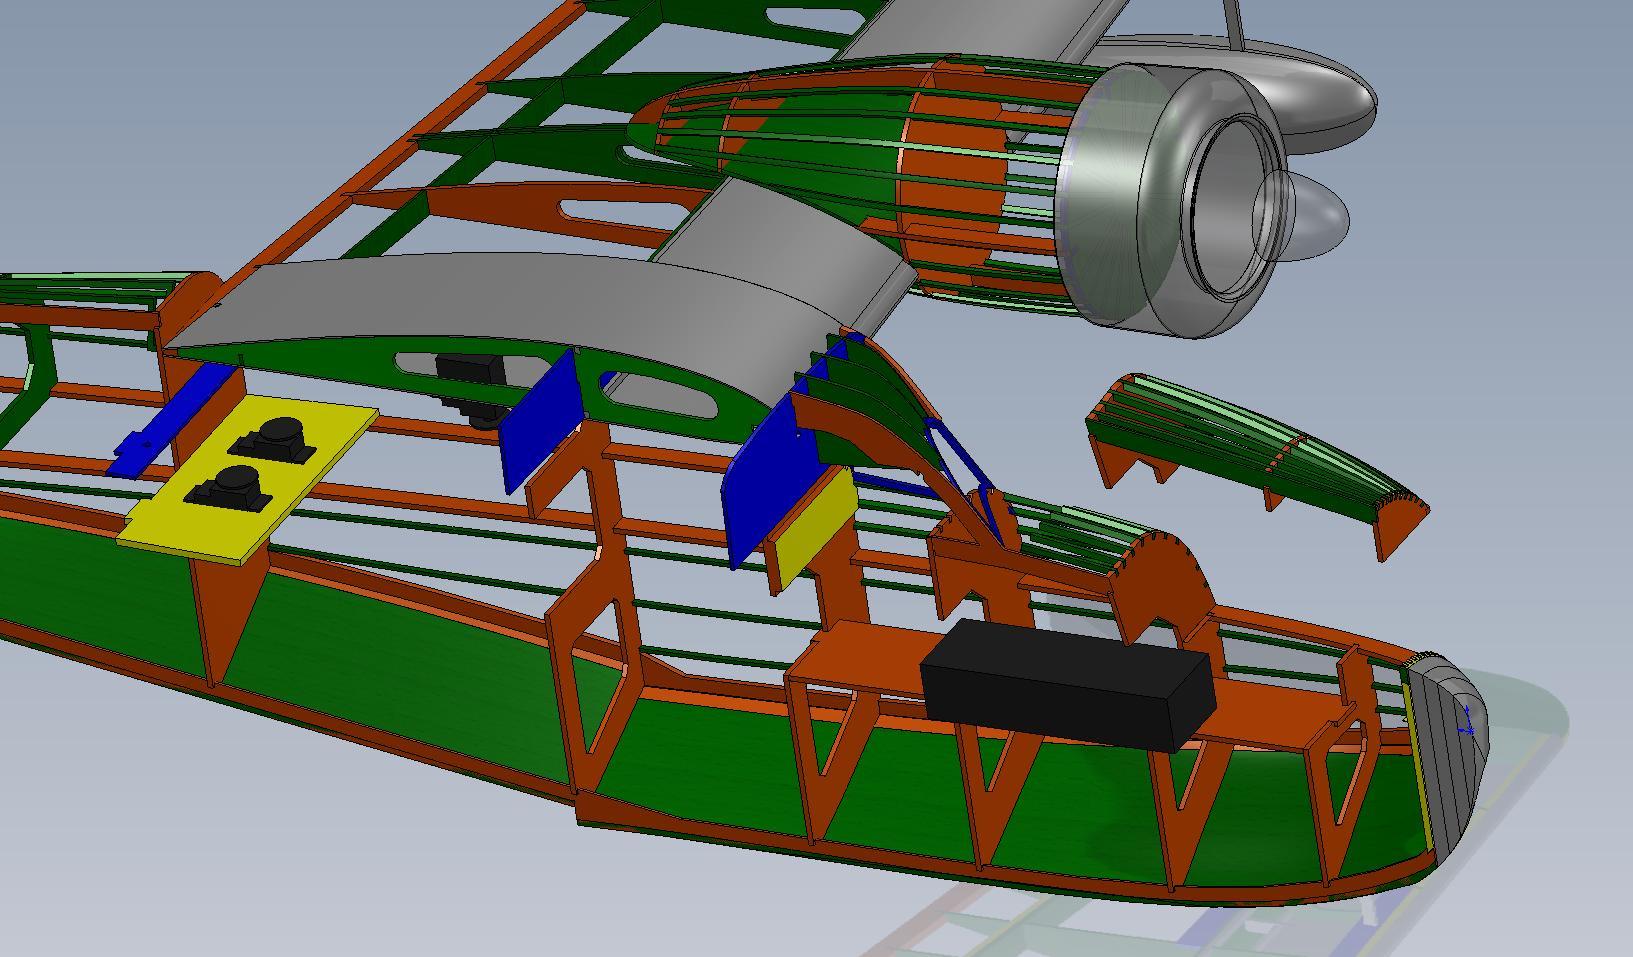 Another shot showing the optional hatch arrangement.